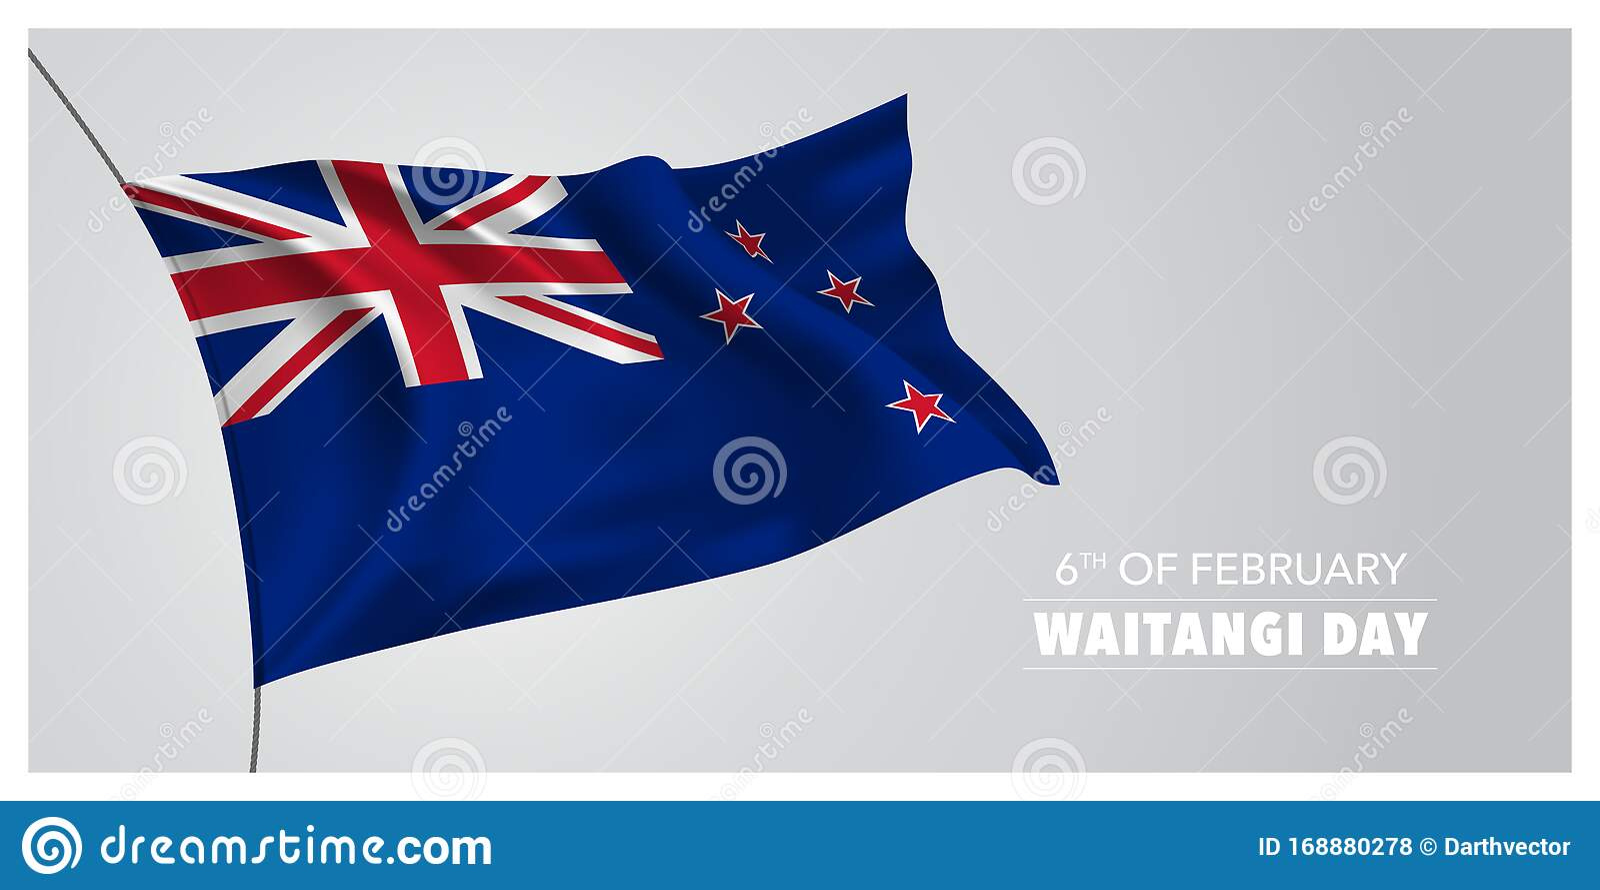 new zealand waitangi day greeting card banner horizontal